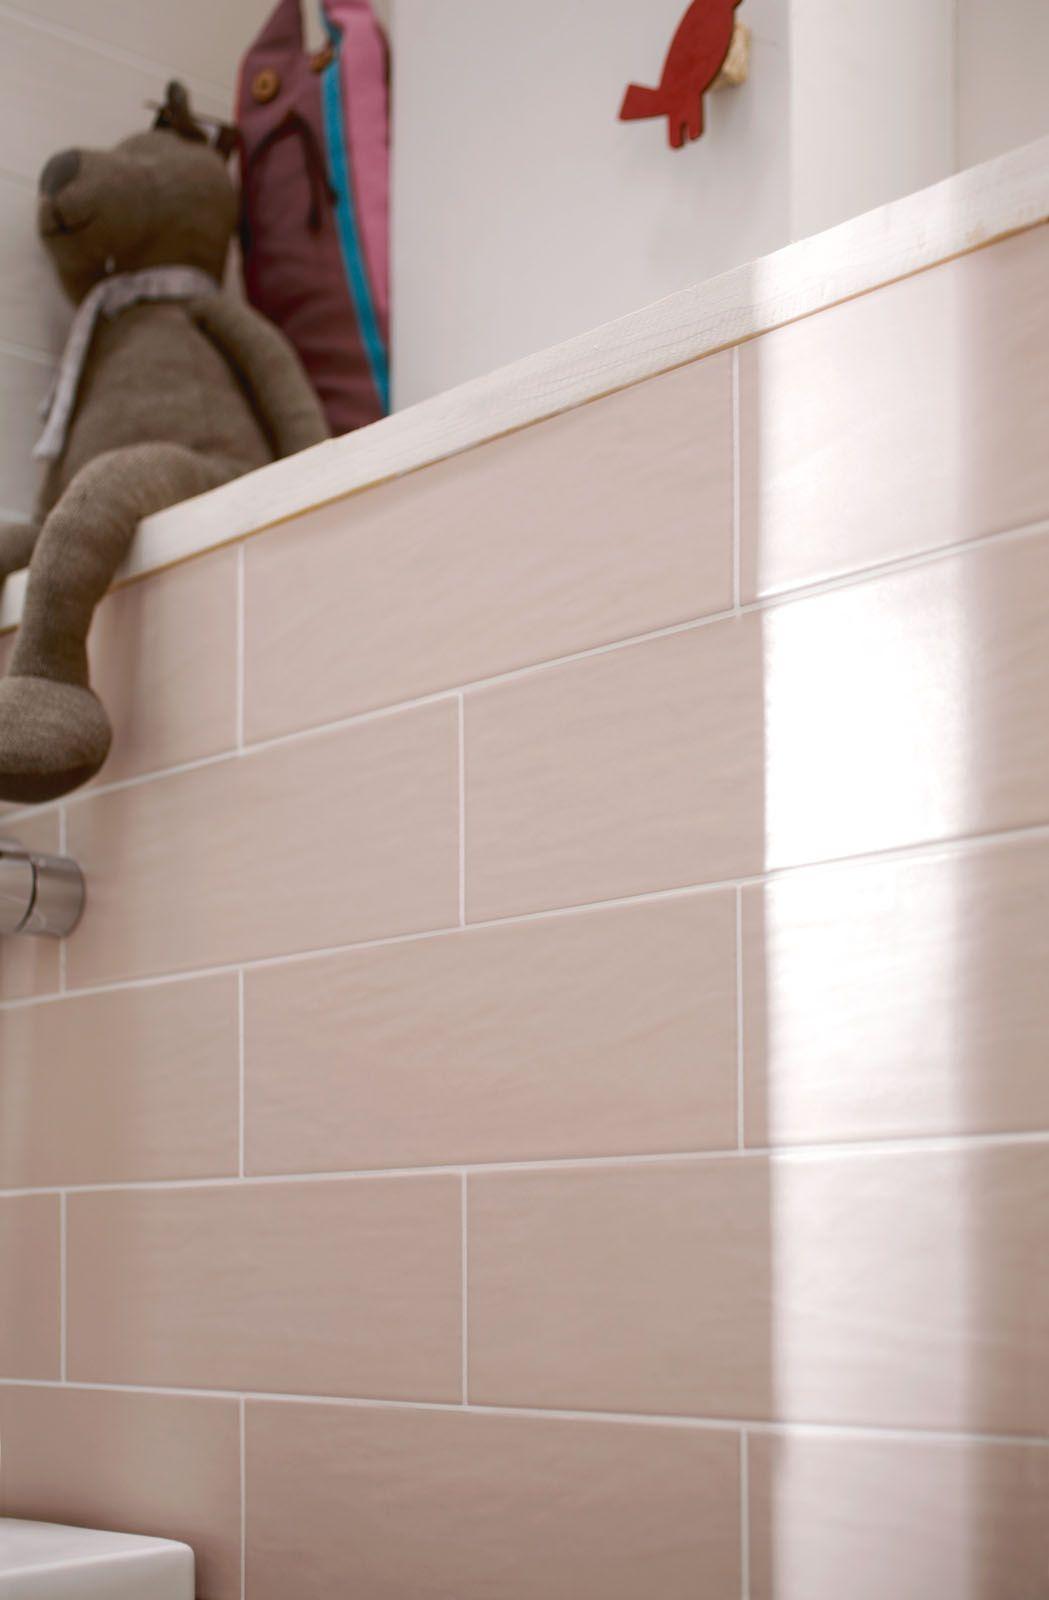 Weekend ceramic tiles Marazzi_3001  Materials  Pinterest  Salle de Bain Salle and Deco